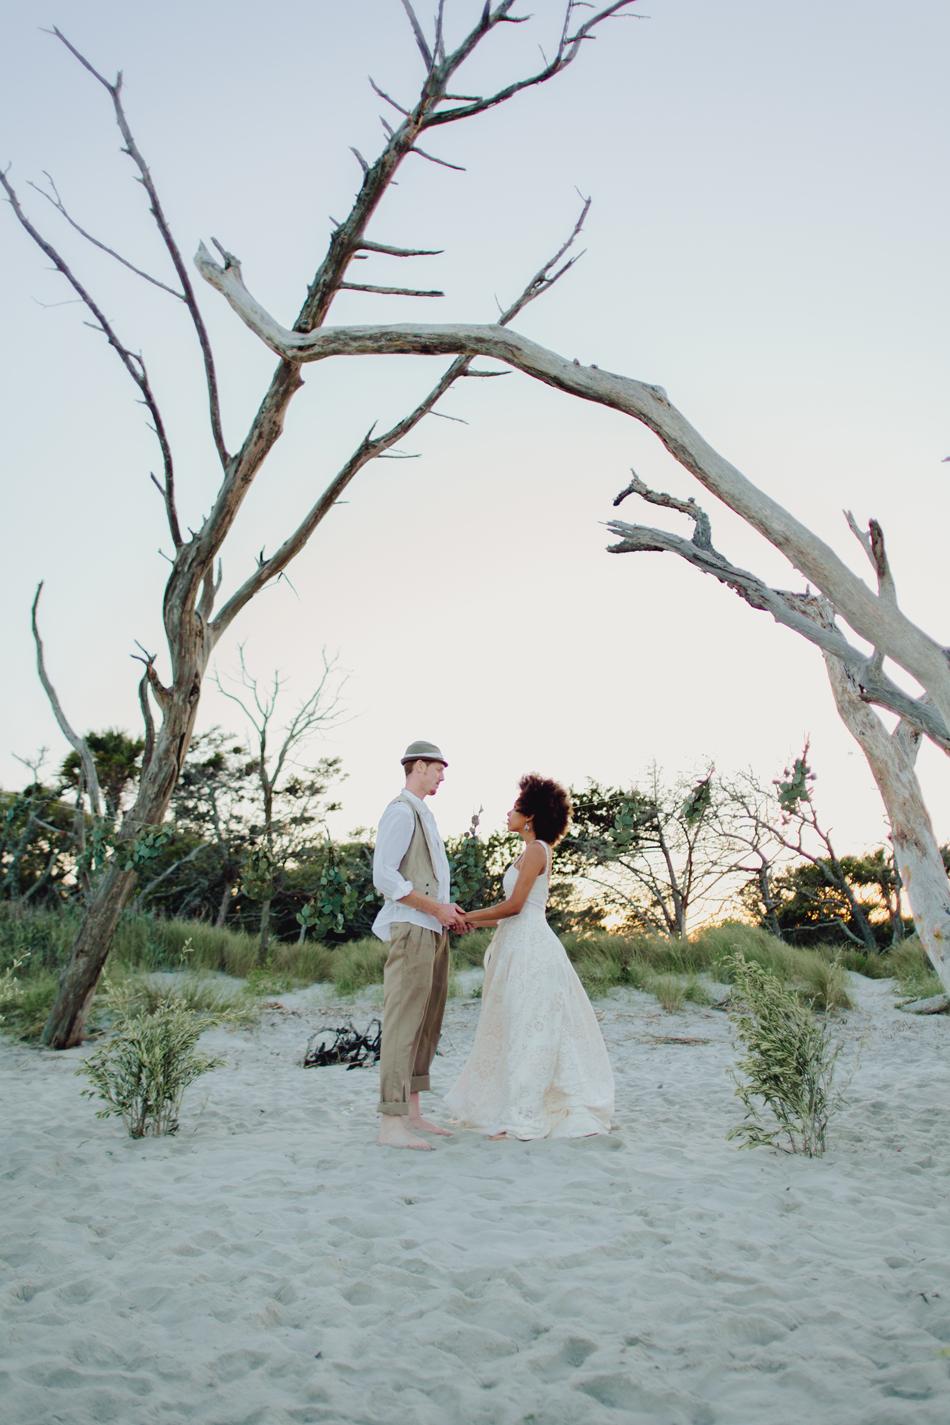 Jameykay_arlie_bohemian_elopement_styled_shoot088.jpg